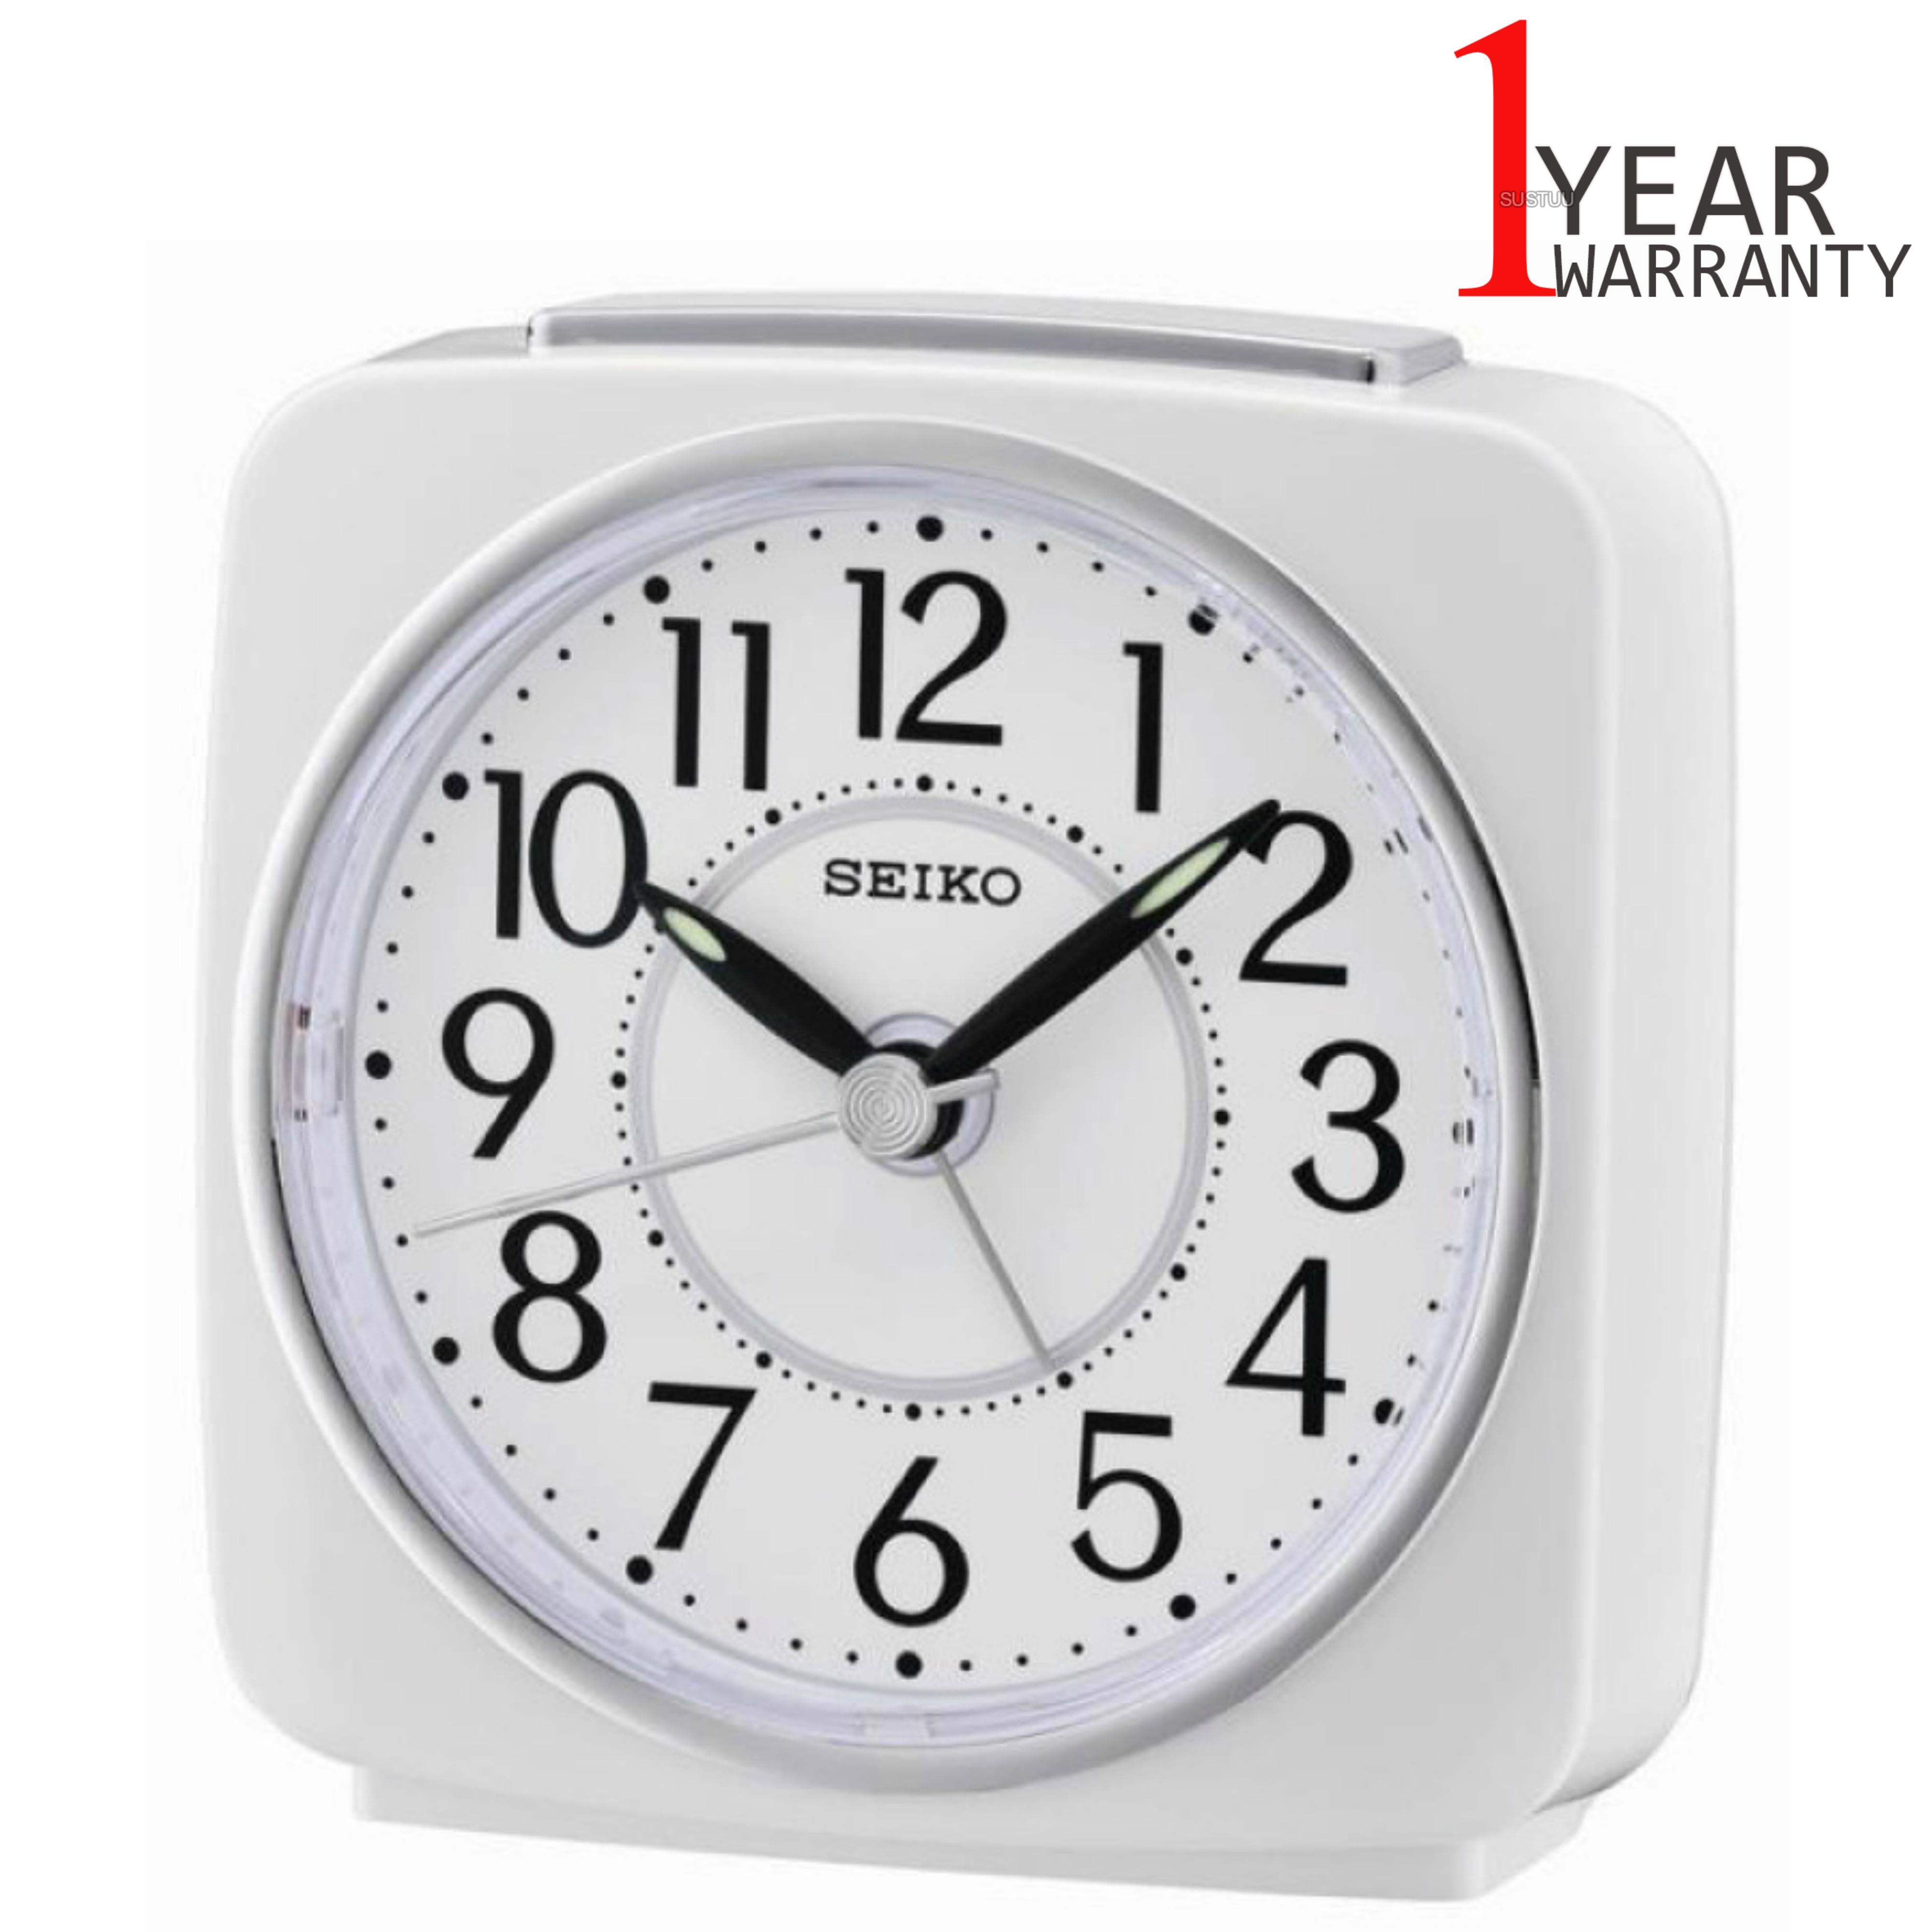 Seiko QHE140W Beep Alarm Analog Clock With Snooze   Lumibrite   Plastic Case   White